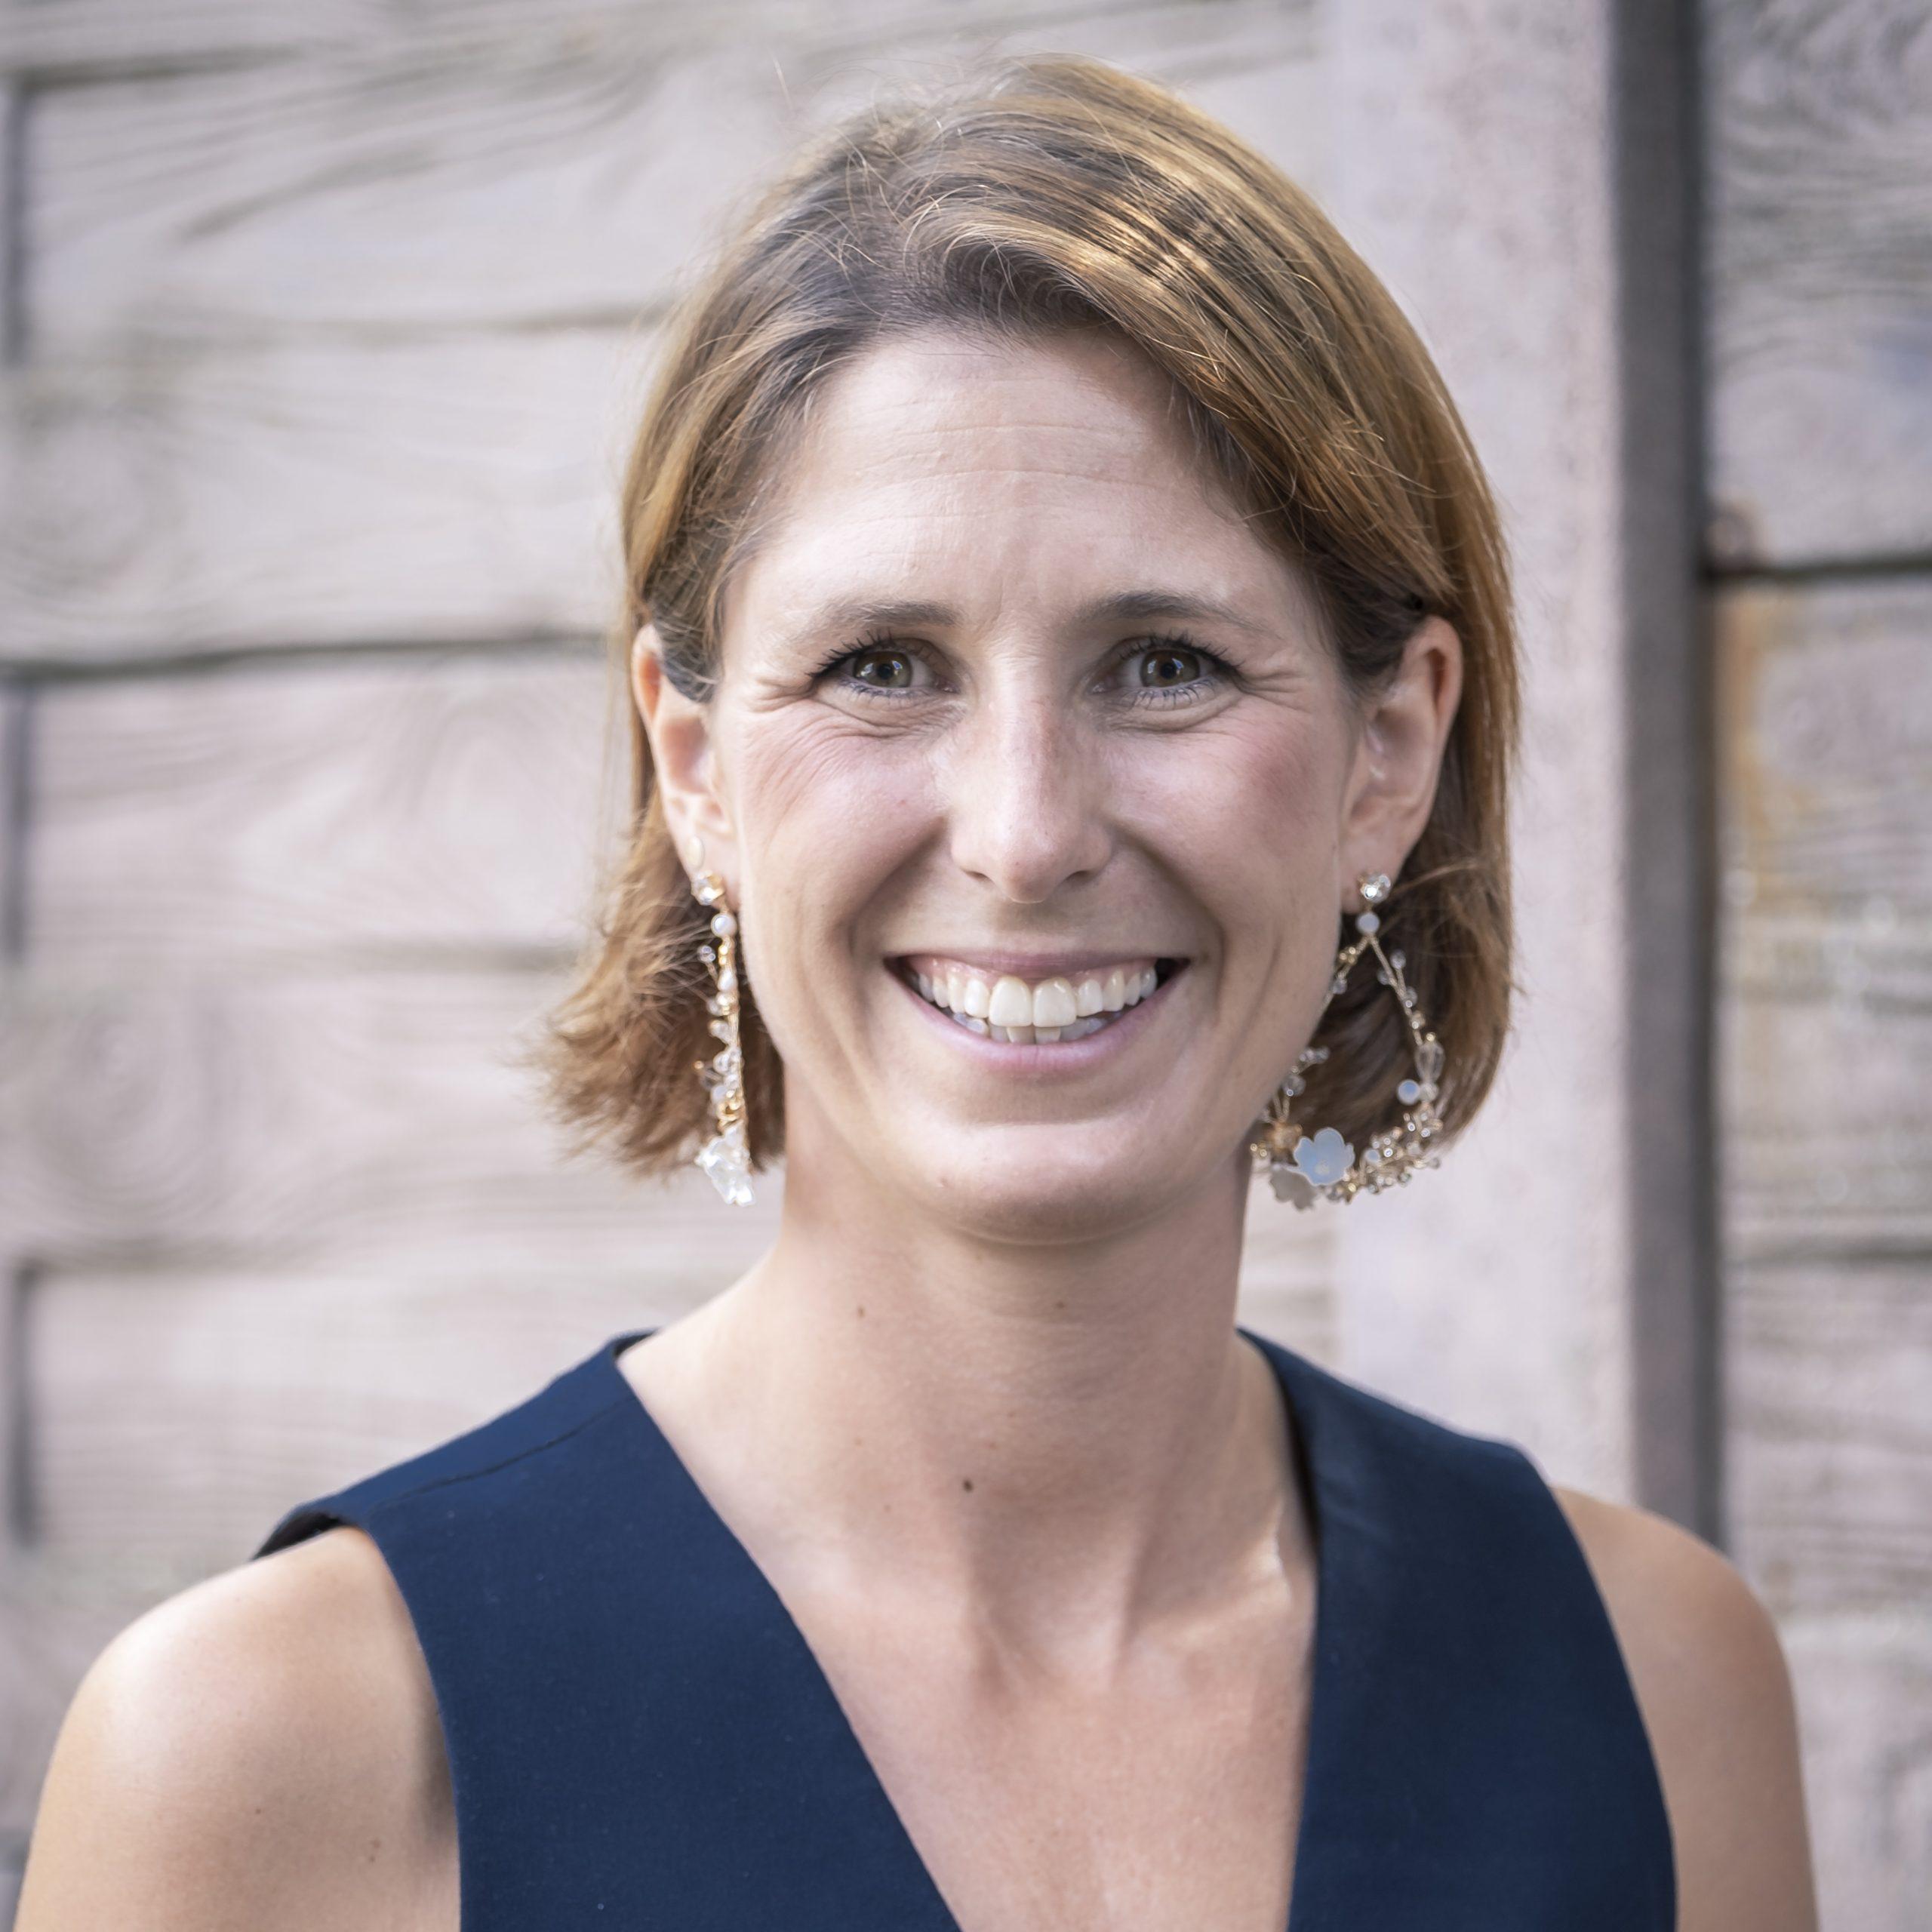 Christine Pahl